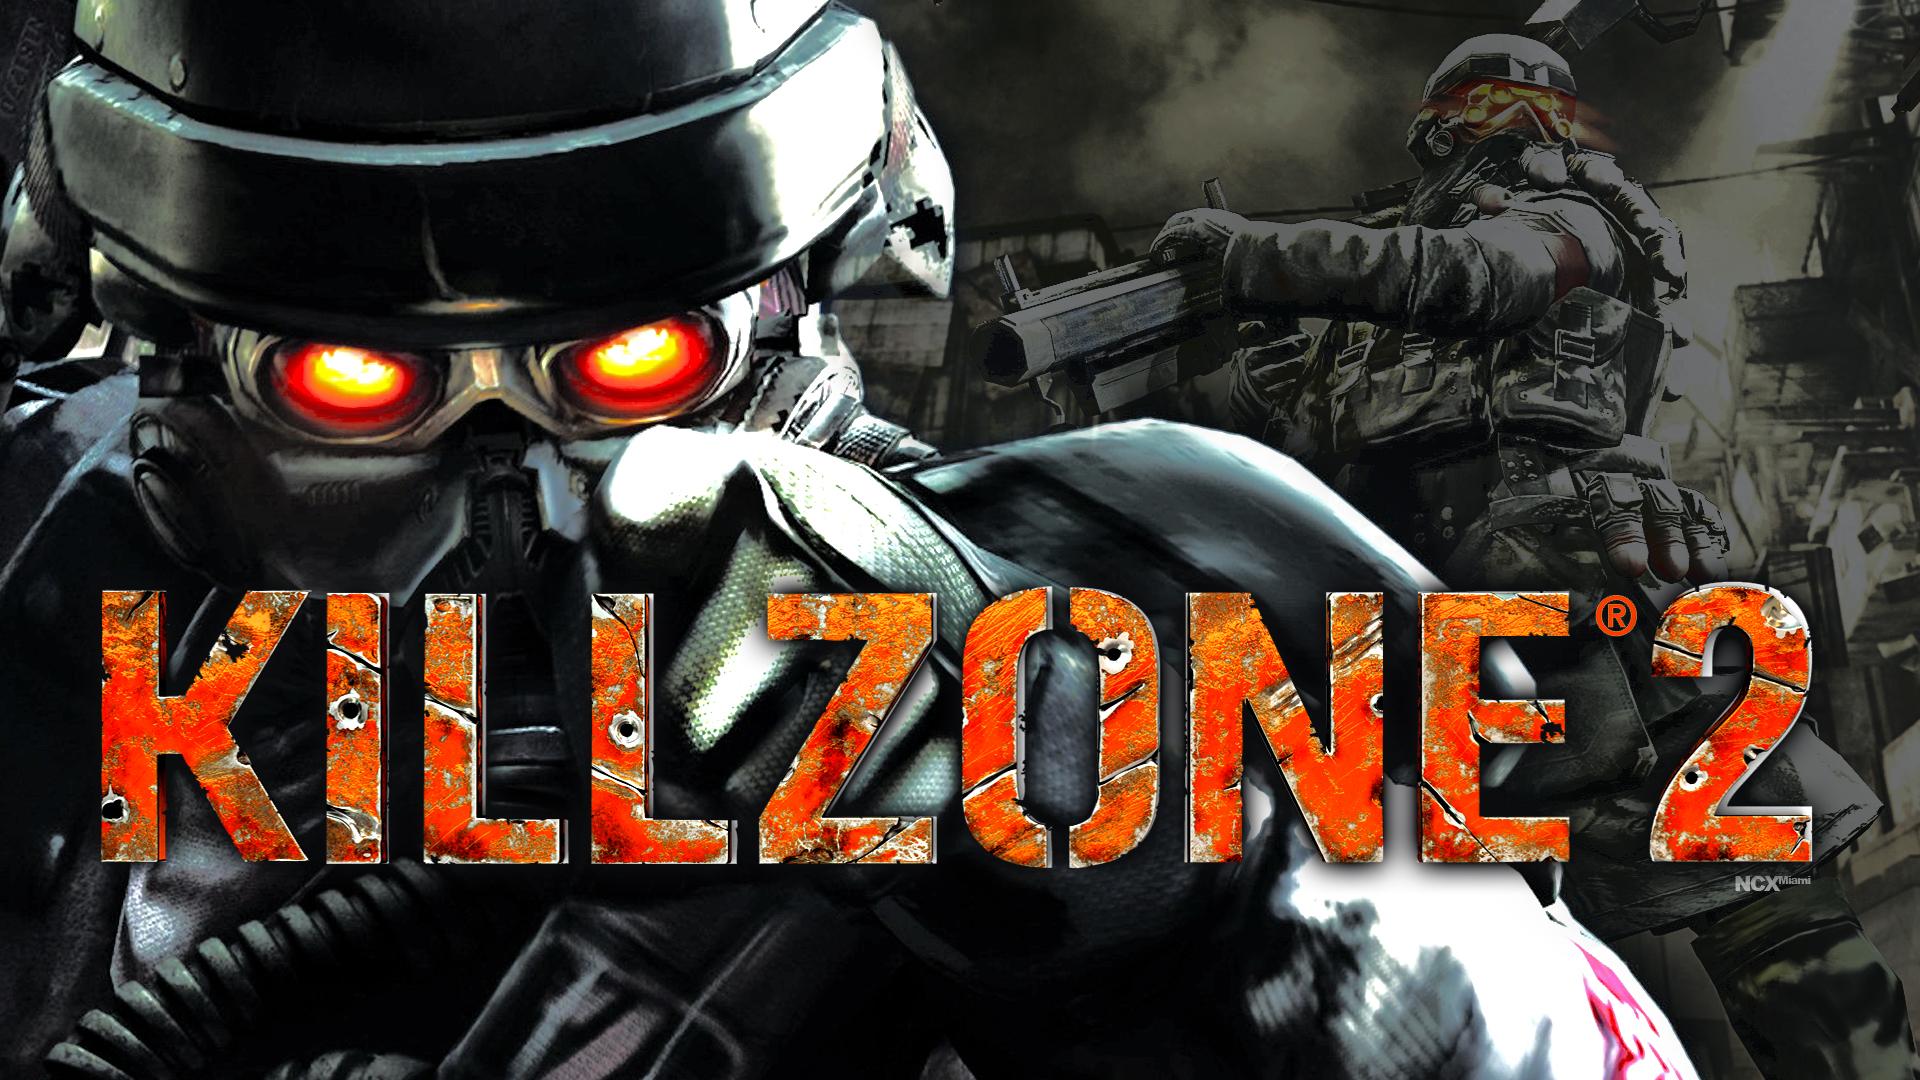 http://www.themindofgame.com/wp-content/uploads/2012/12/killzone2_wallpaper_1080p.jpg